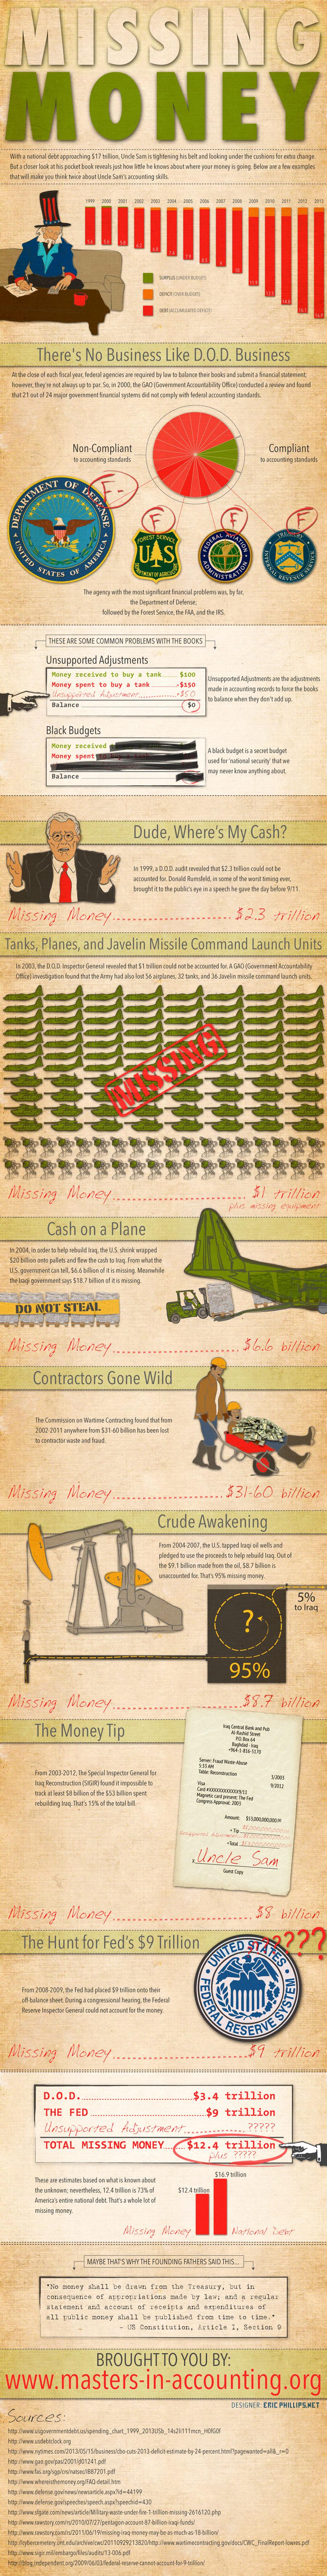 Missing Money Infographic